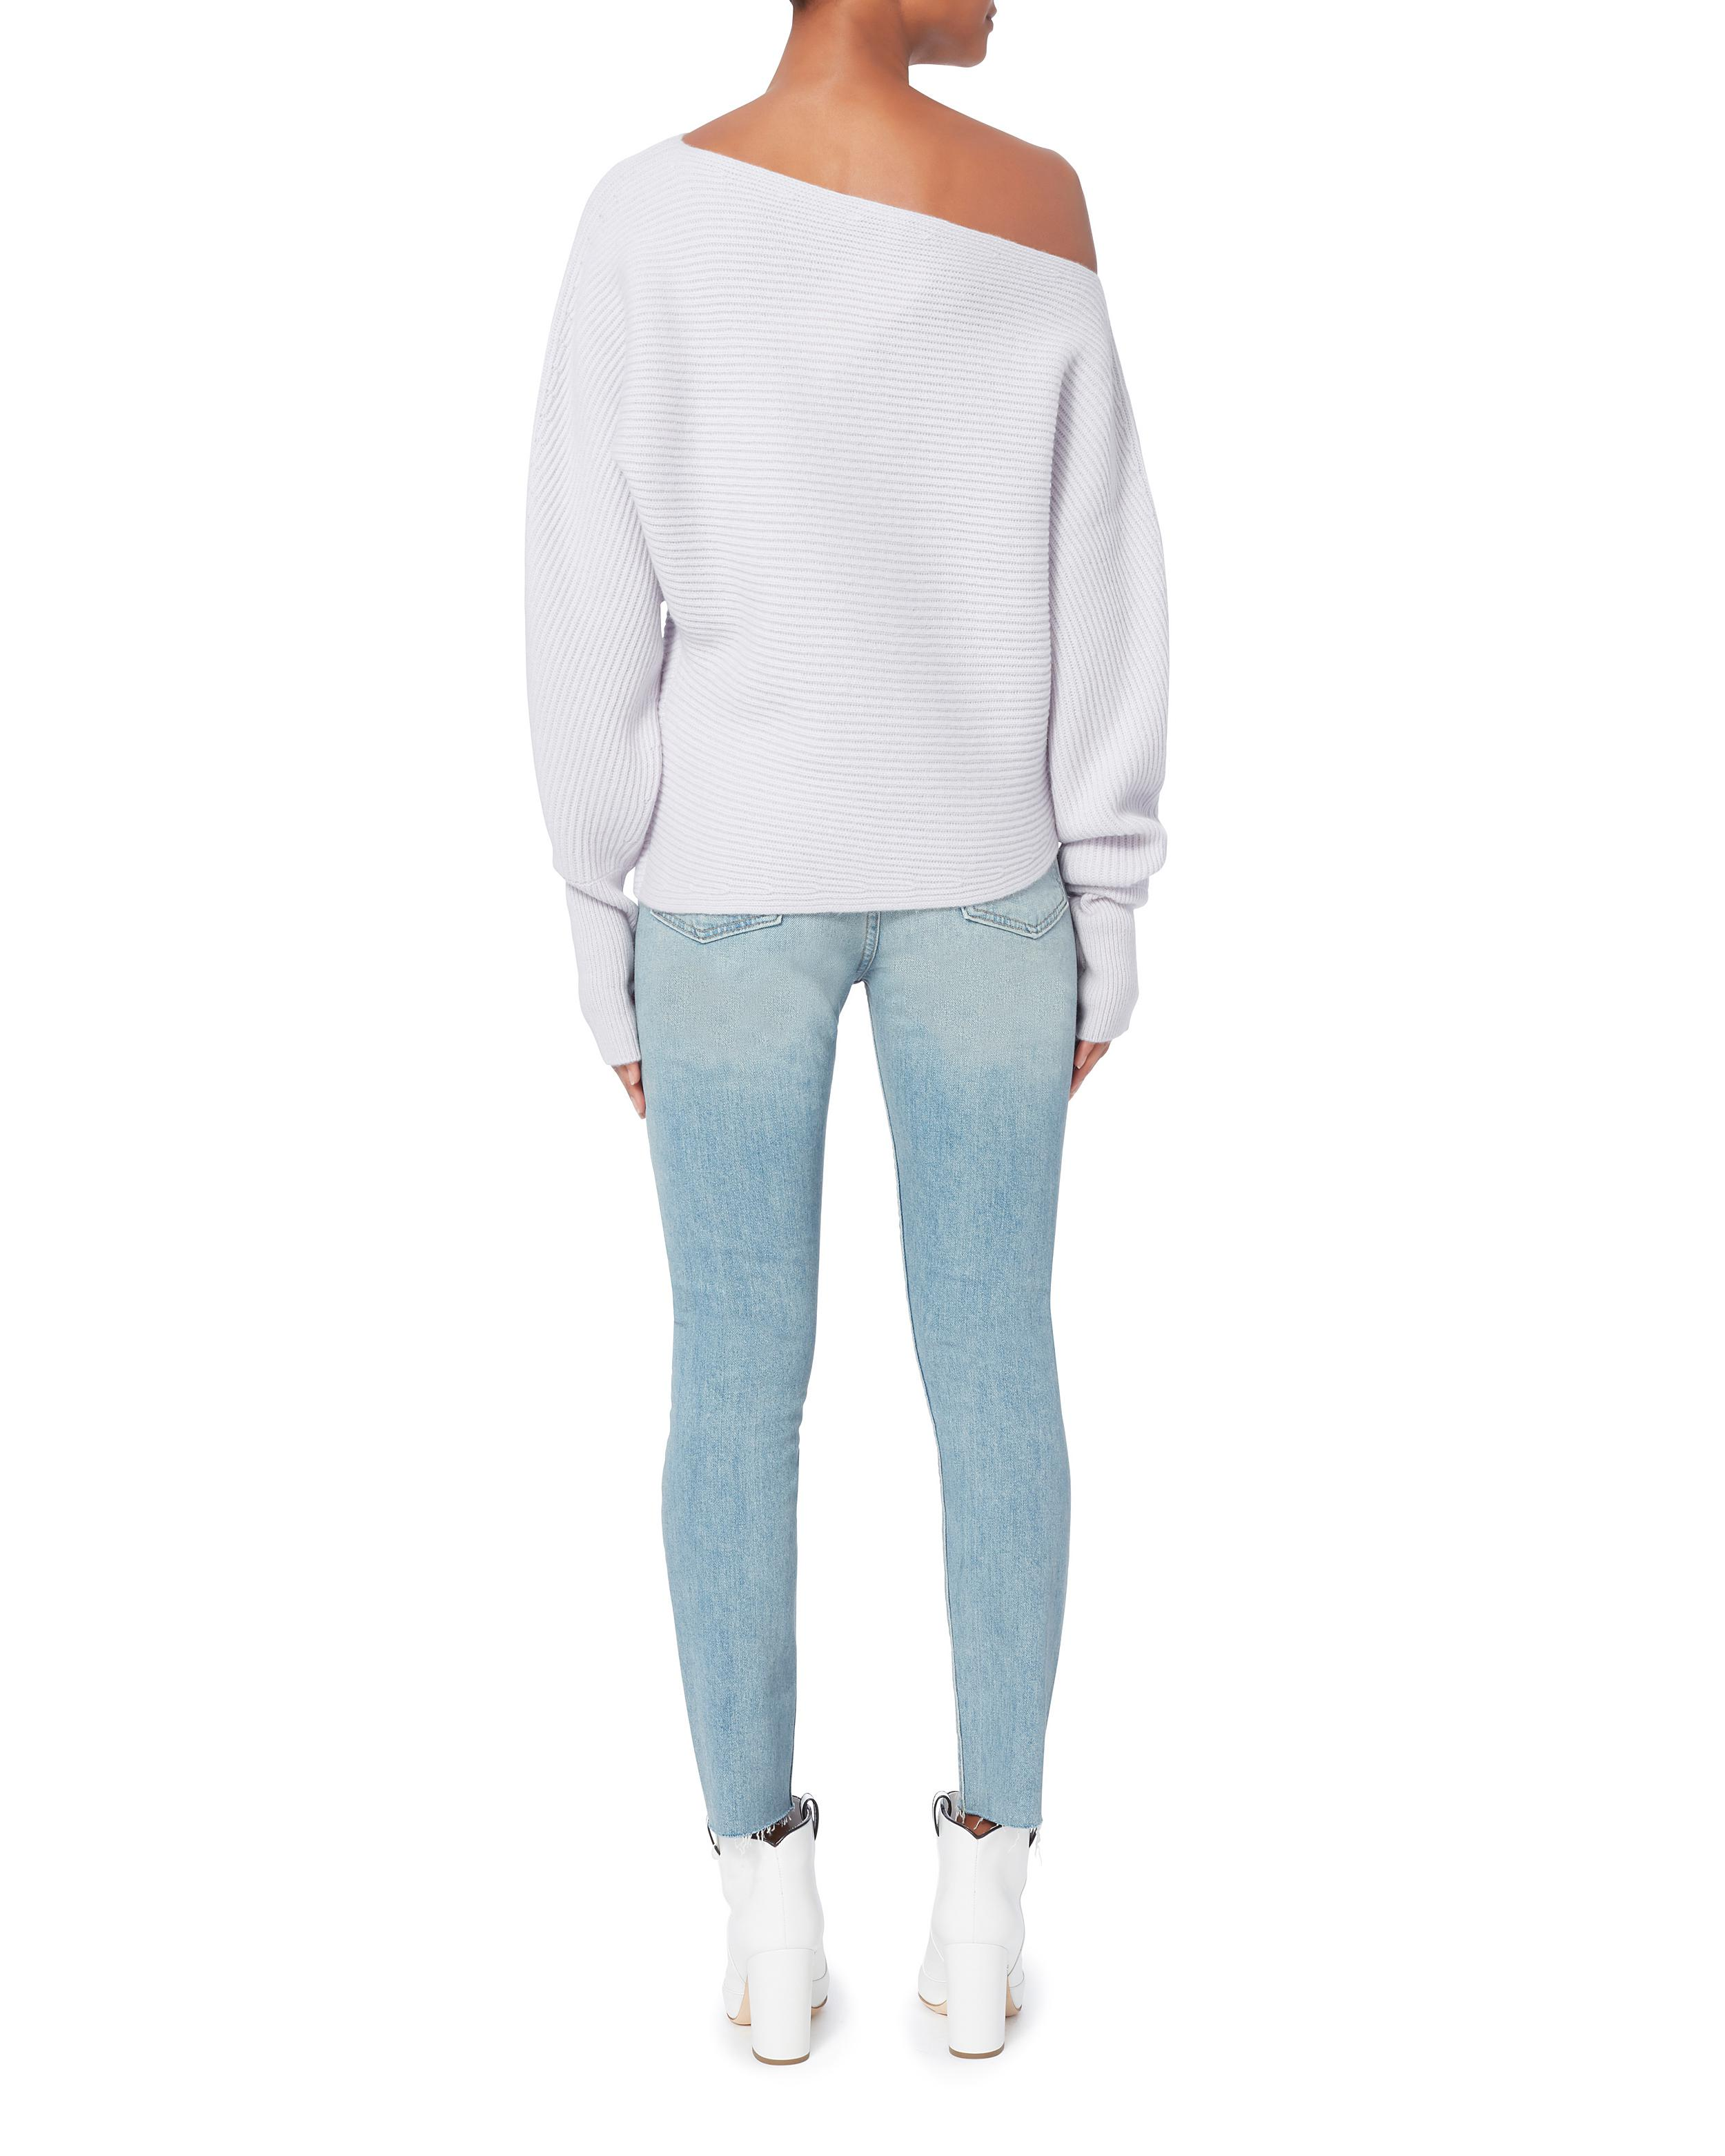 59f28e8443 Lyst - Intermix Jacqueline Off Shoulder Light Blue Sweater in Blue